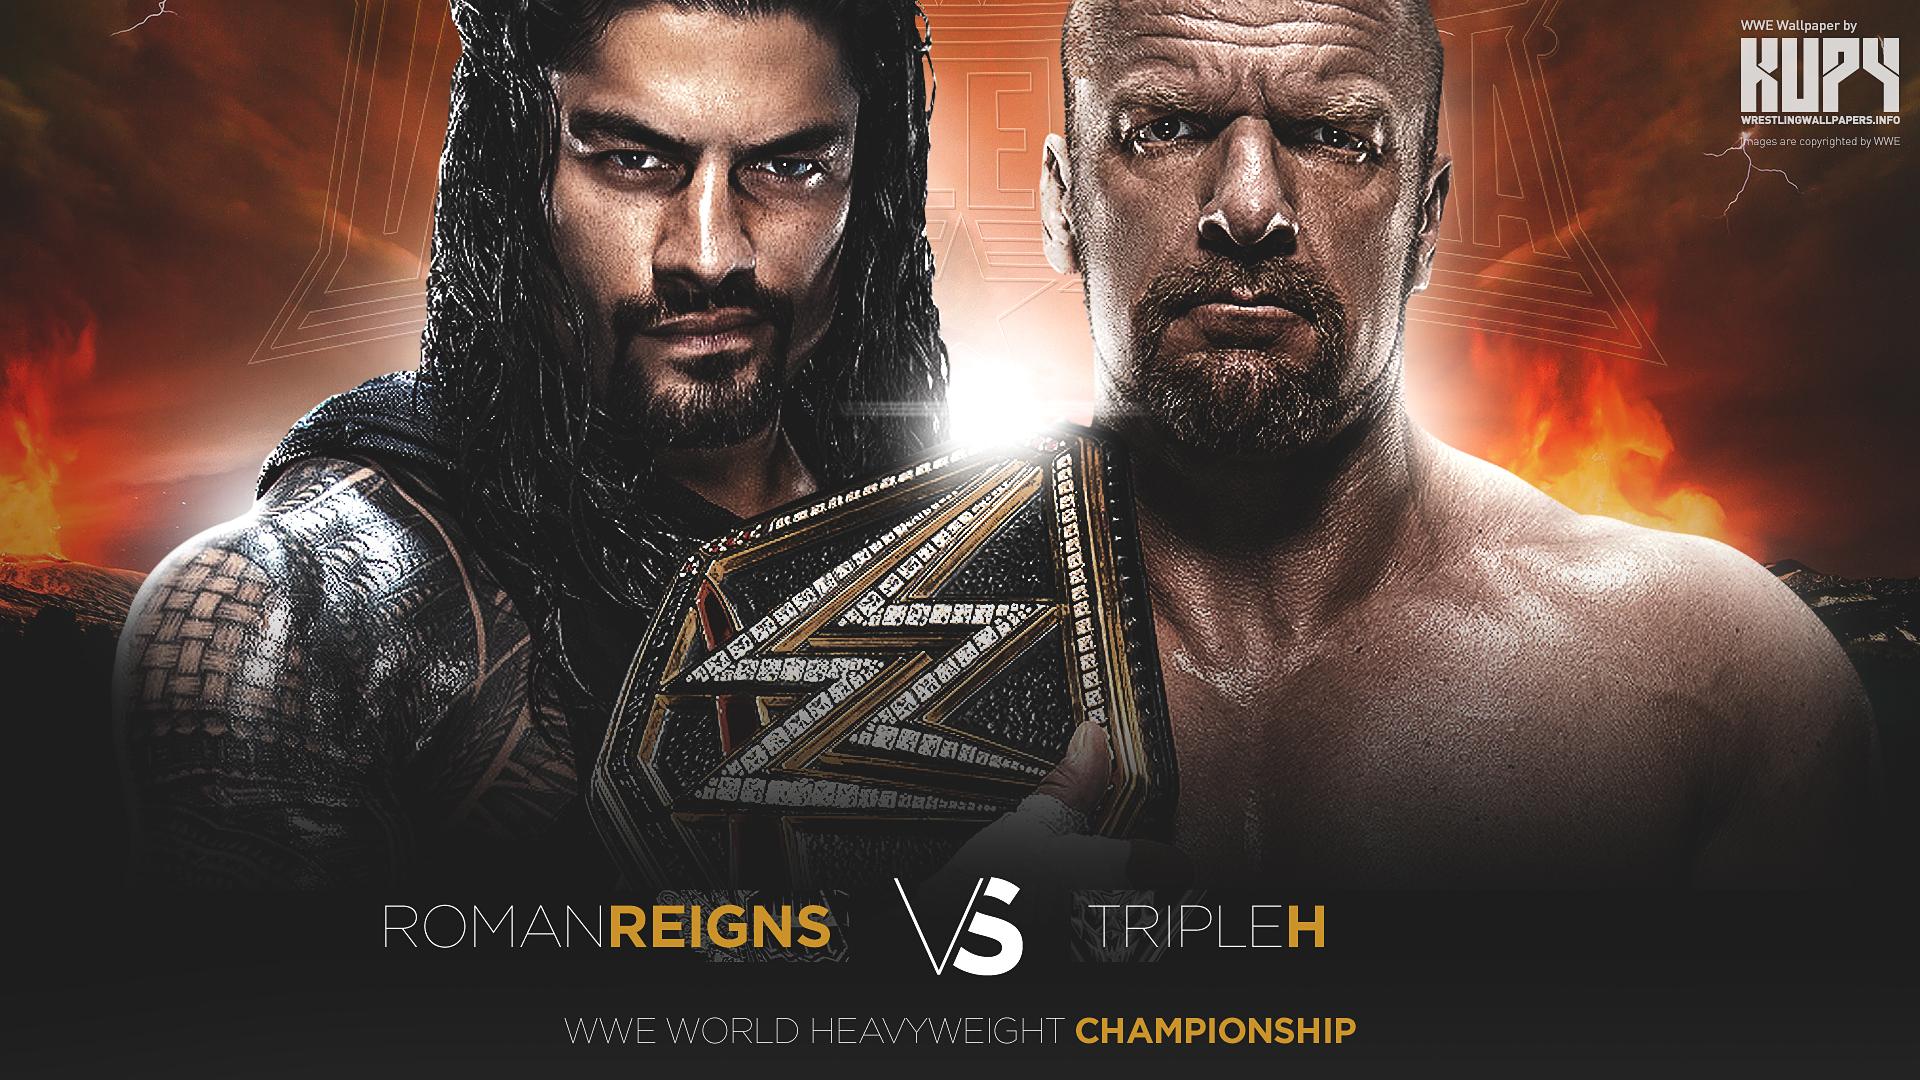 New Wrestlemania 32 Roman Reigns Vs Triple H Wallpaper Kupy